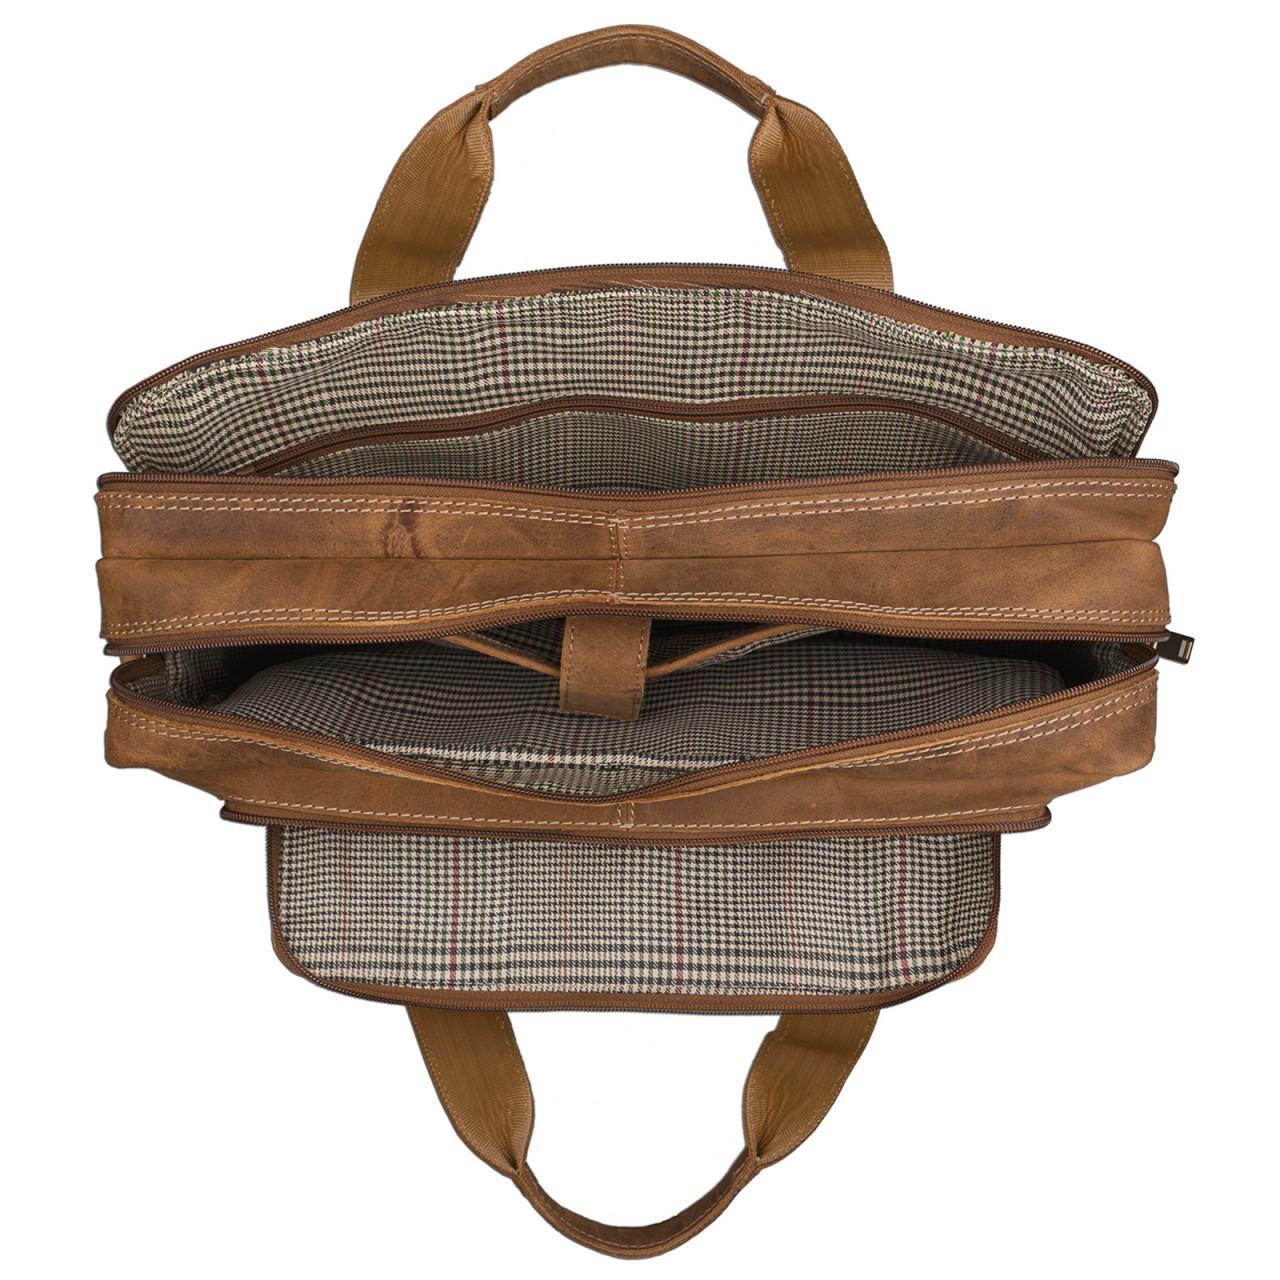 STILORD Vintage Herren Umhängetasche Leder groß Ledertasche Büro Business Studium Uni Lehrertasche Tabletfach 12 Zoll echtes Rinds Leder Braun - Bild 4